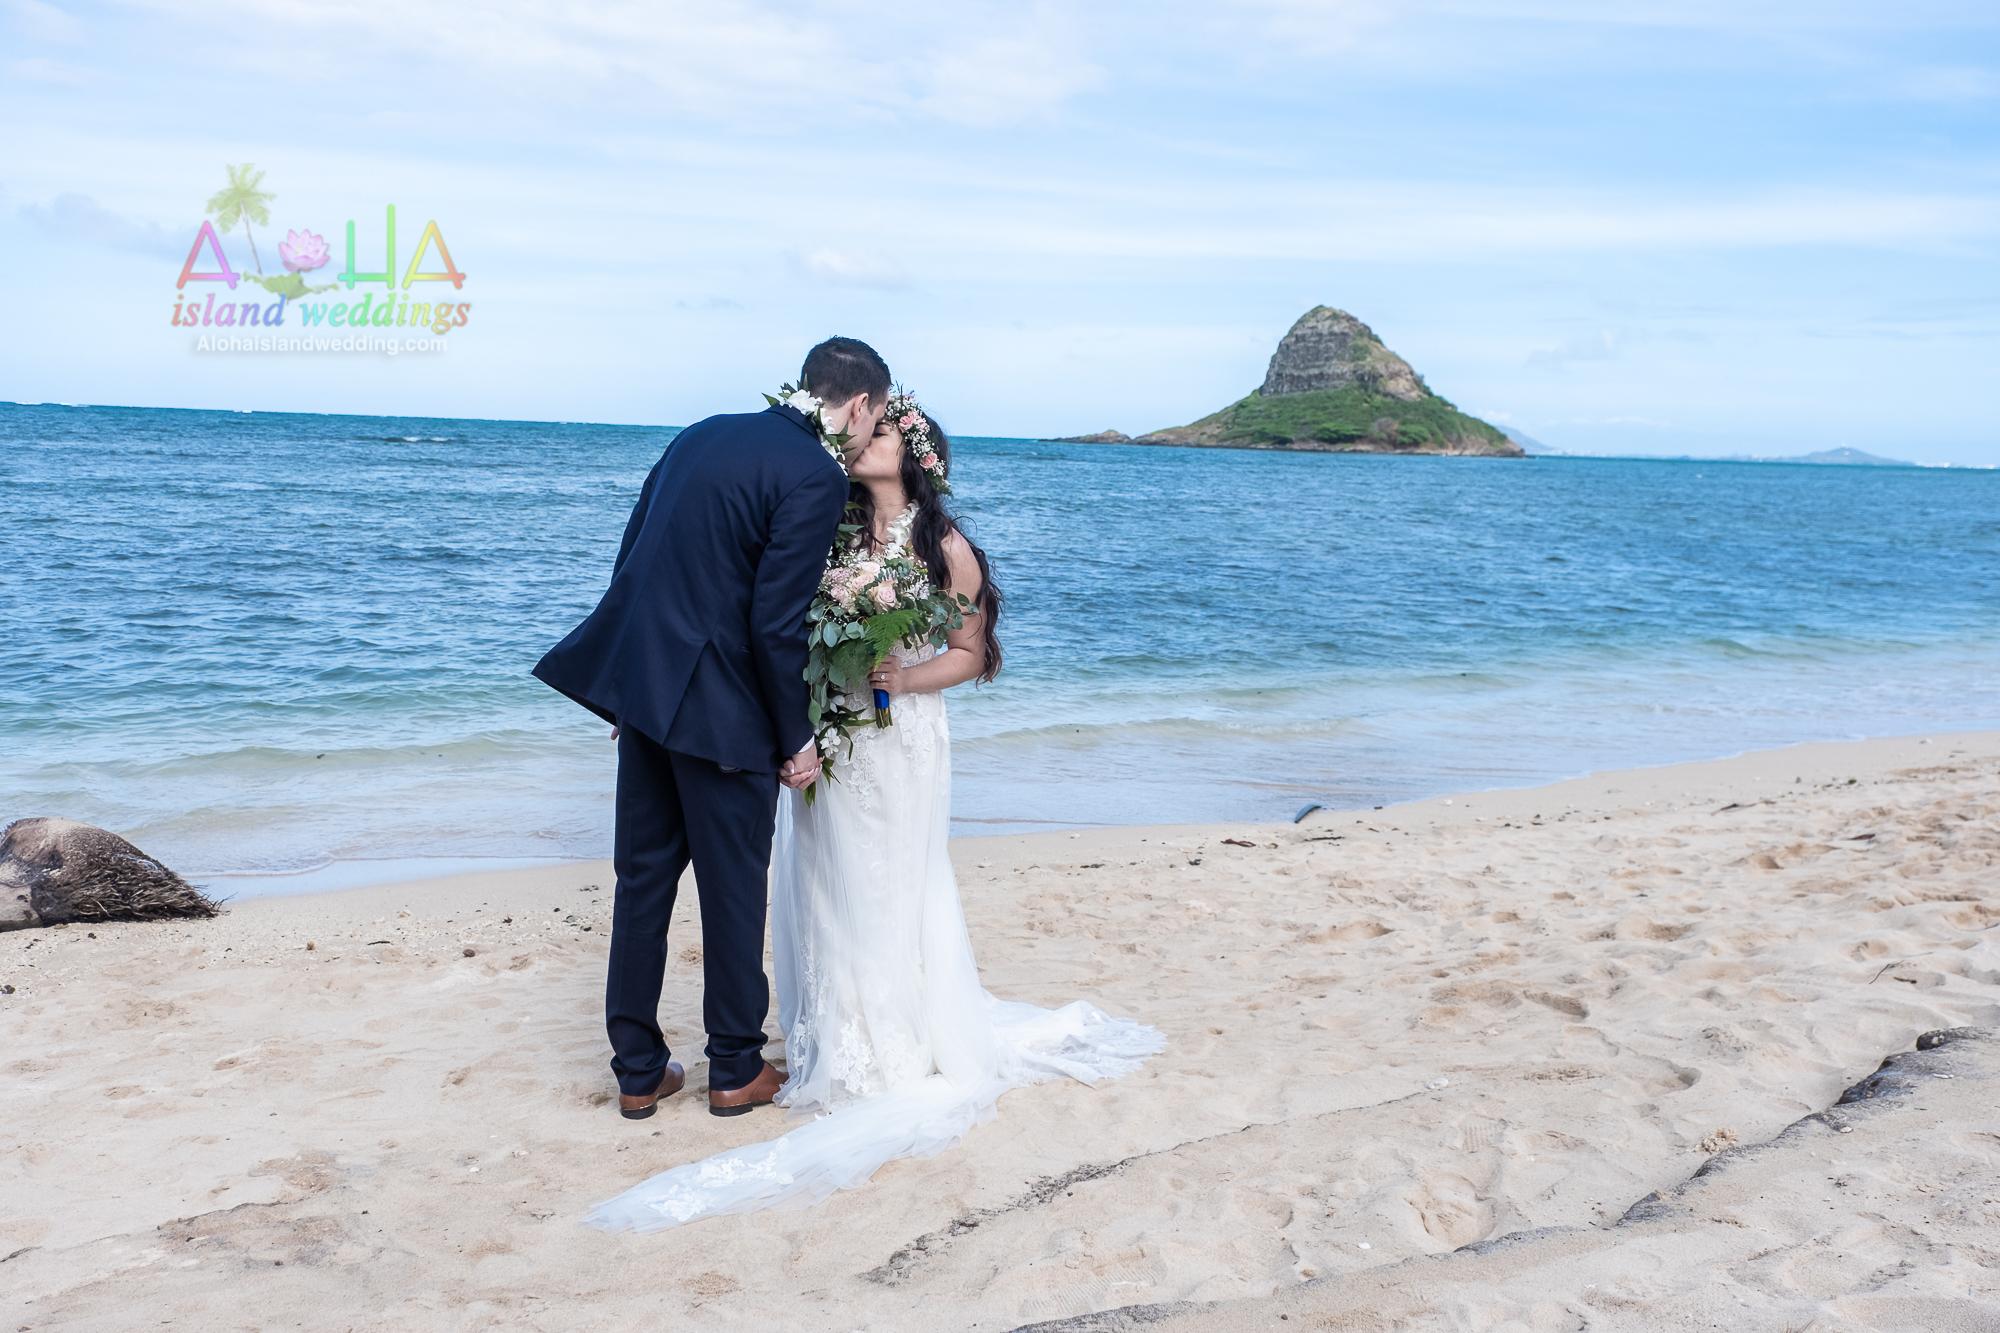 Hawaii weddings and events, Kualoa-24